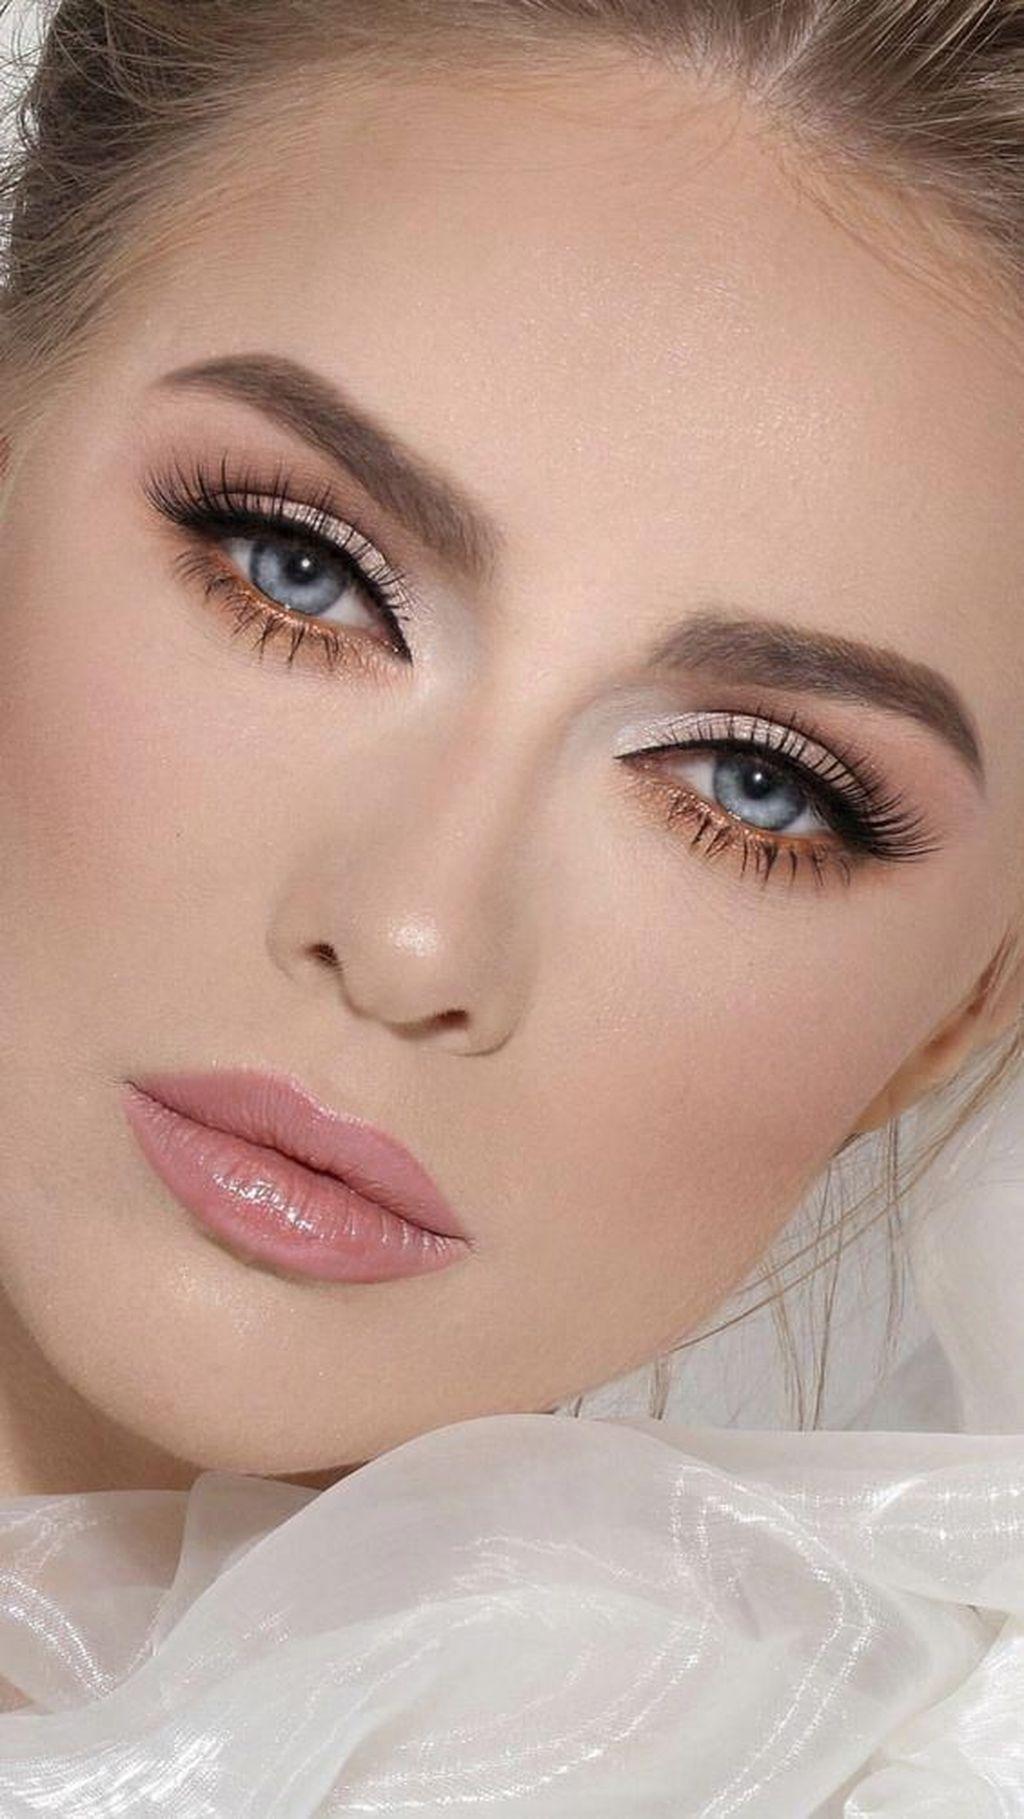 41 lovely makeup tutorials ideas for blue eyes | blue eye